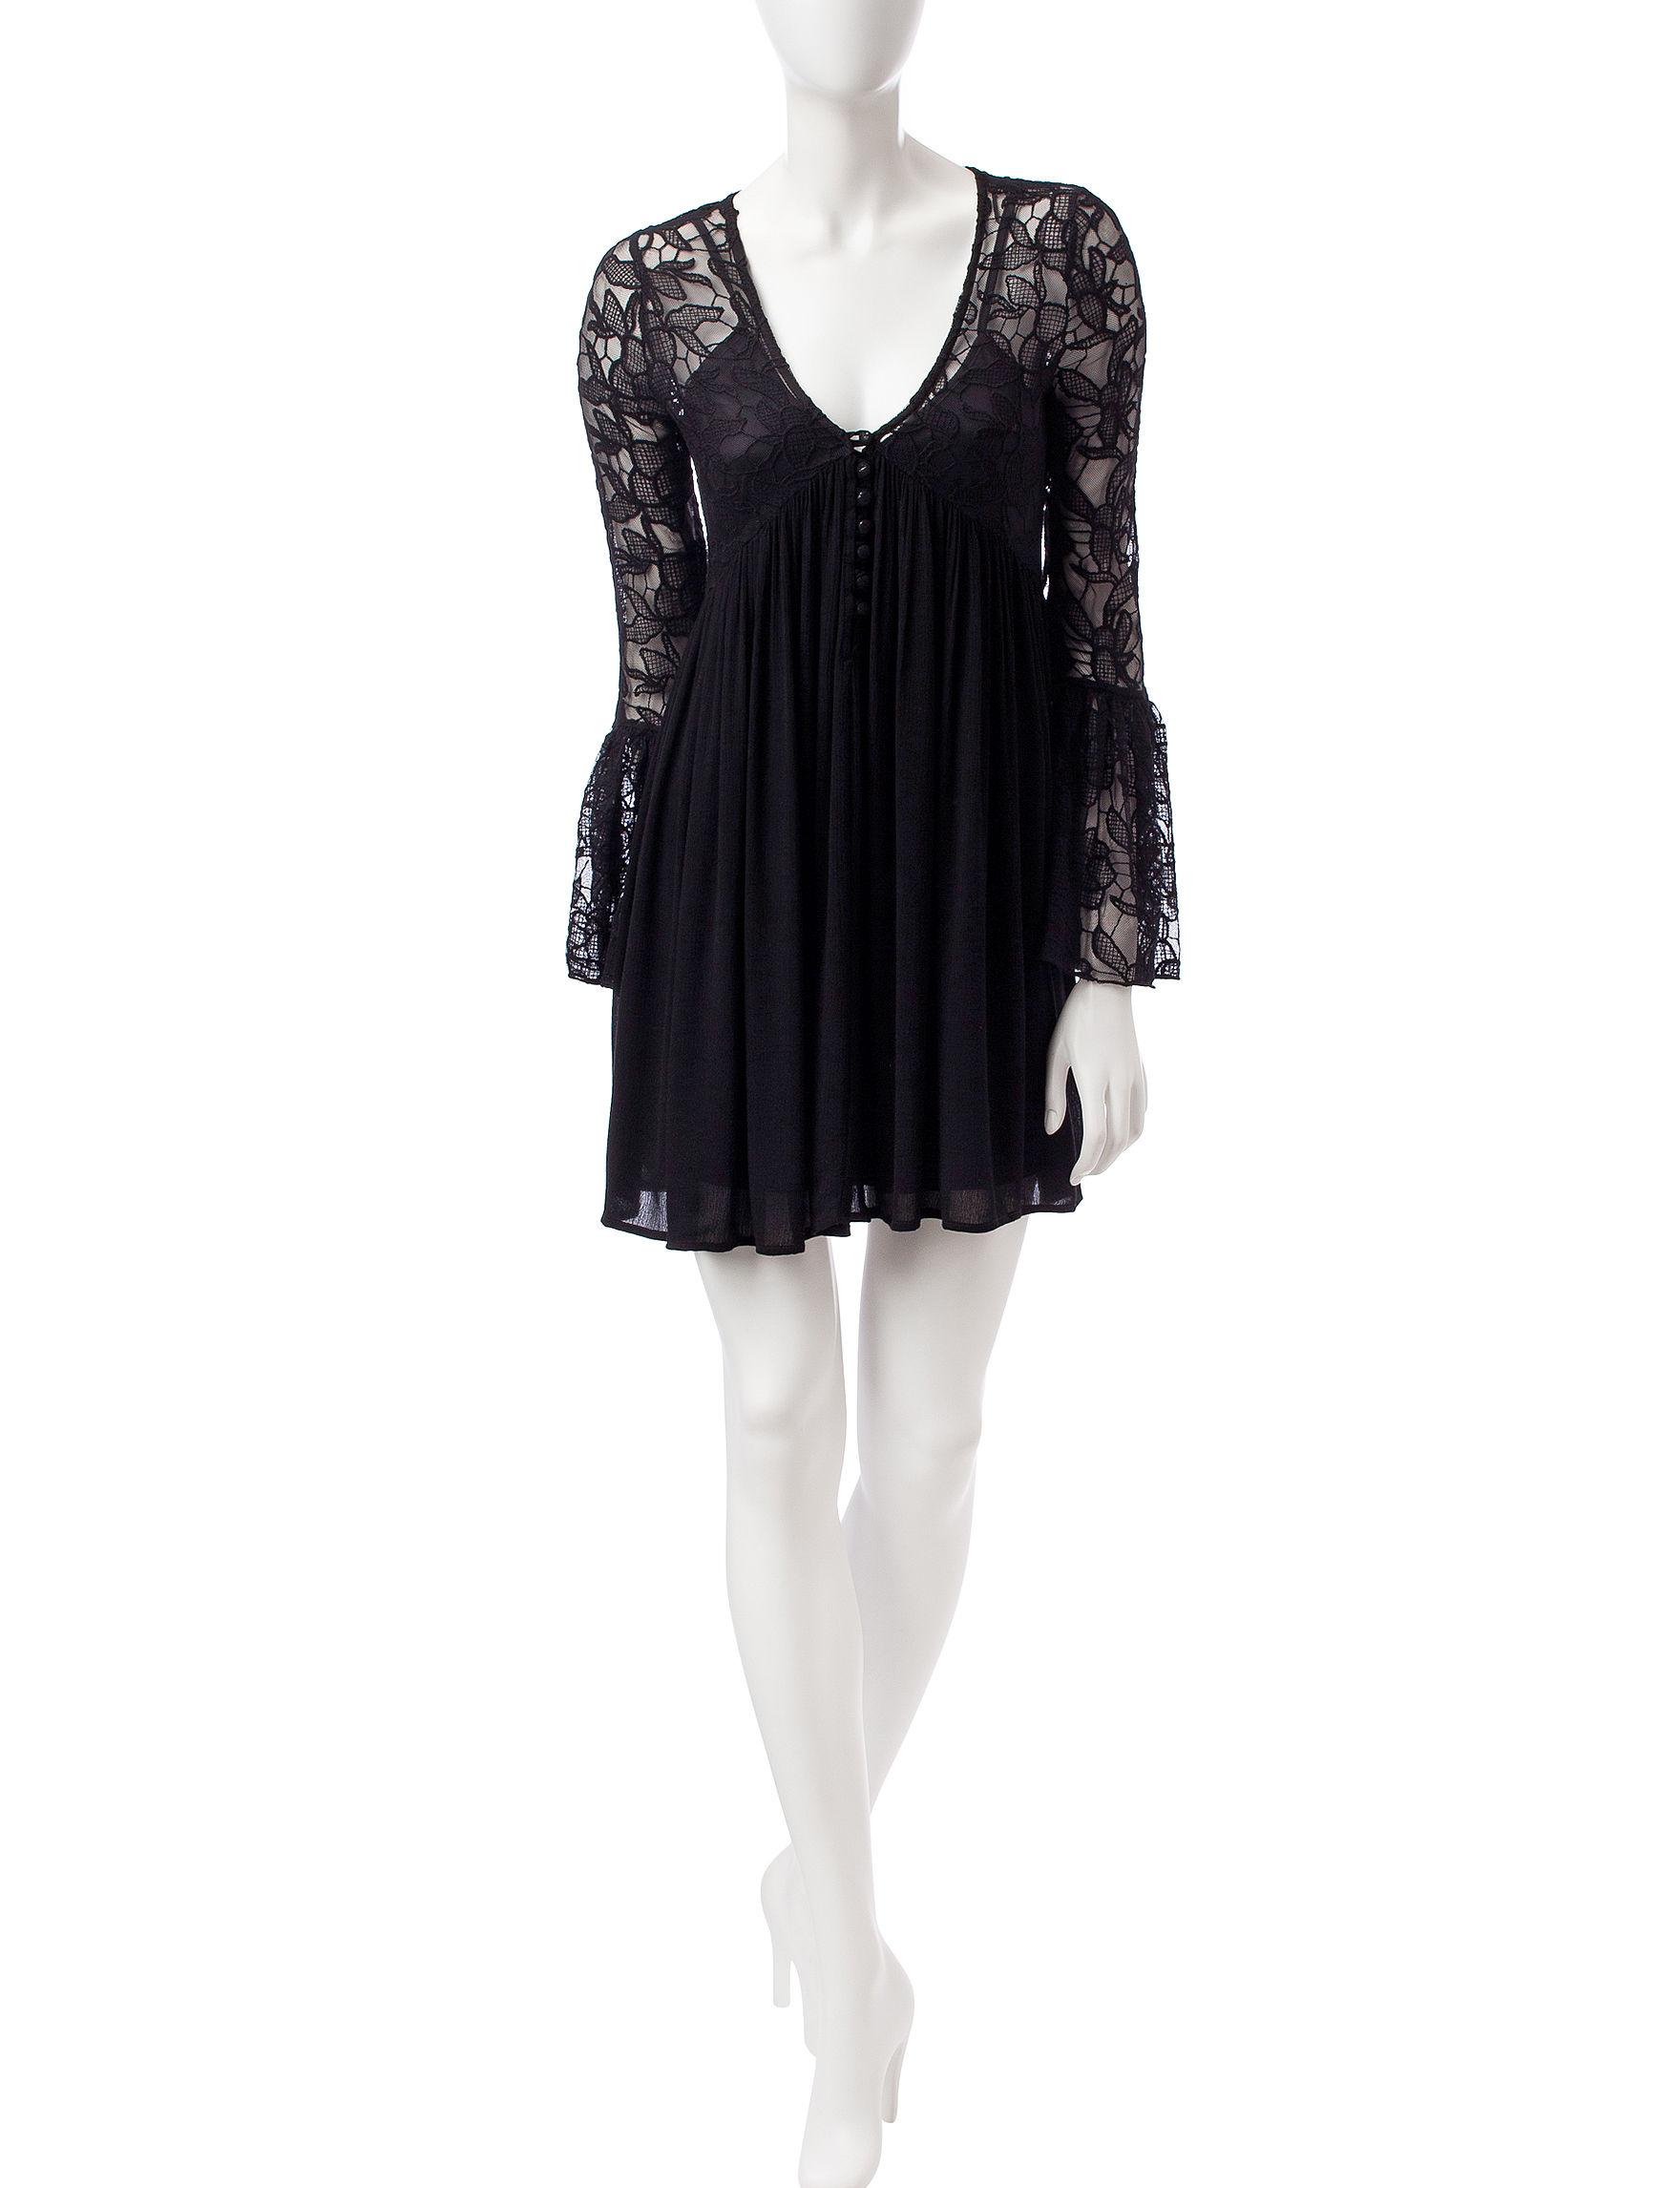 Romeo + Juliet Couture Black Cocktail & Party Fit & Flare Dresses